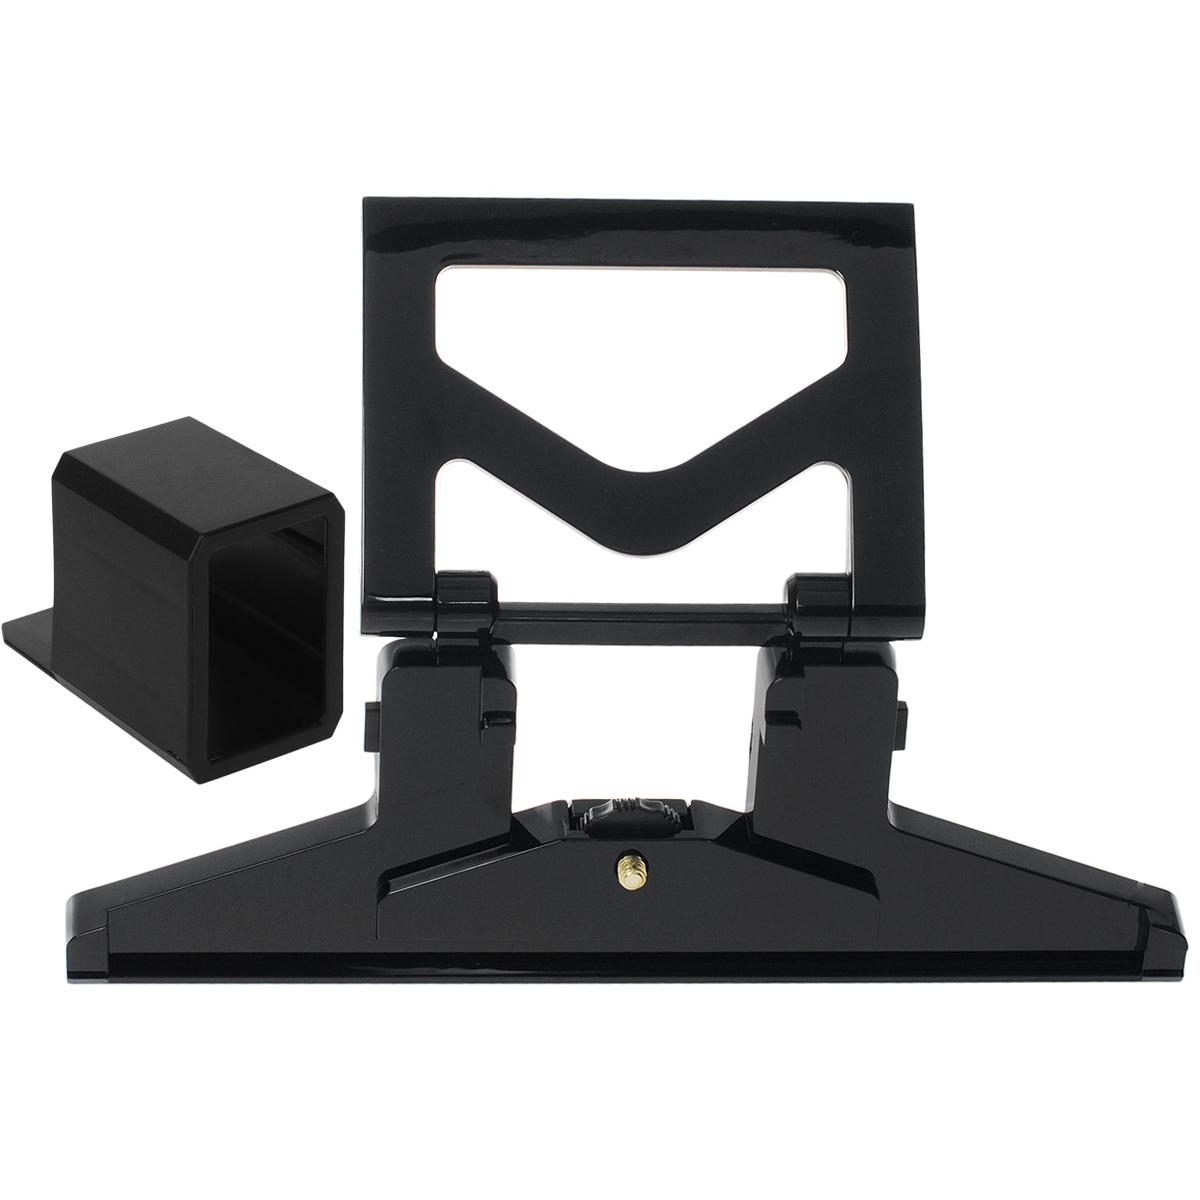 Крепление на телевизор Black Horns для Kinect Xbox One cmi replacement kinect ir camera sensor for xbox 360 black brown